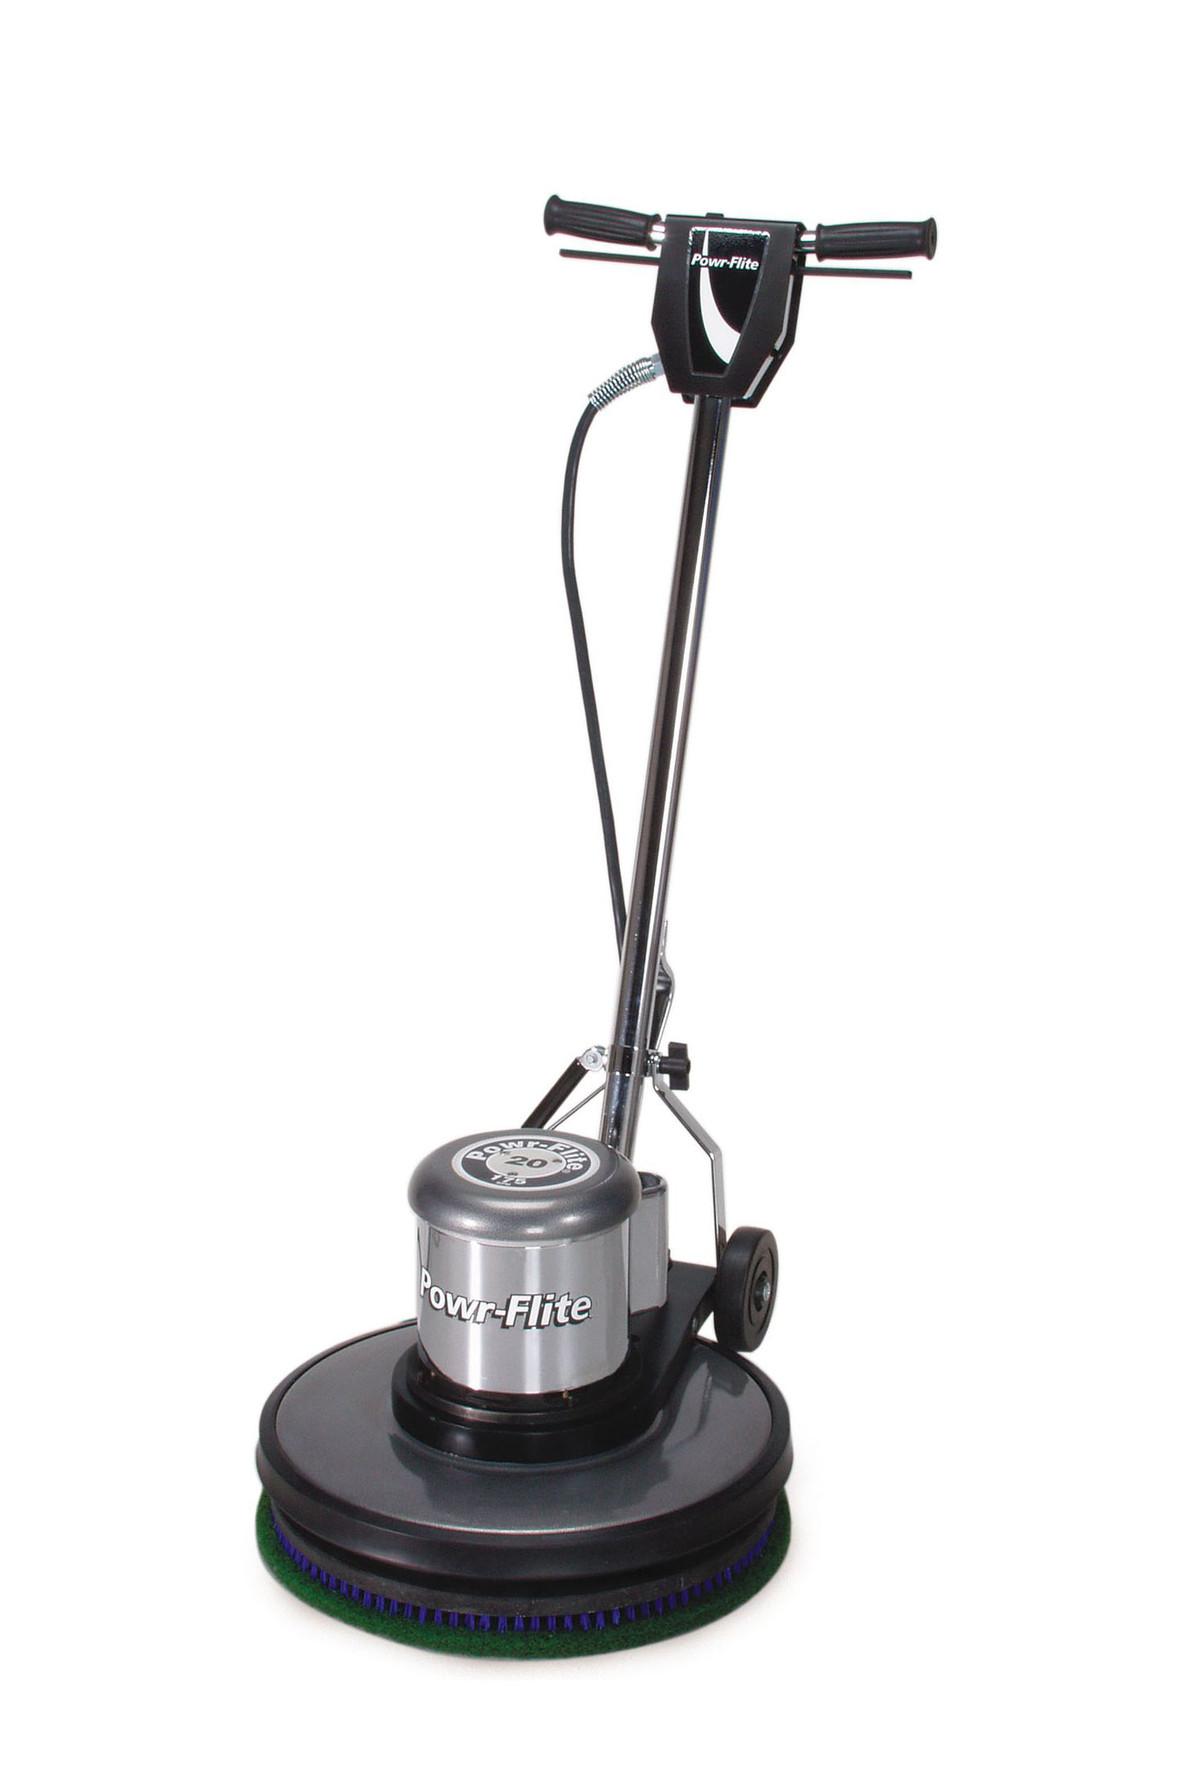 "Powr-Flite 20"" Classic Metal Floor Machine, 1.5 HP"